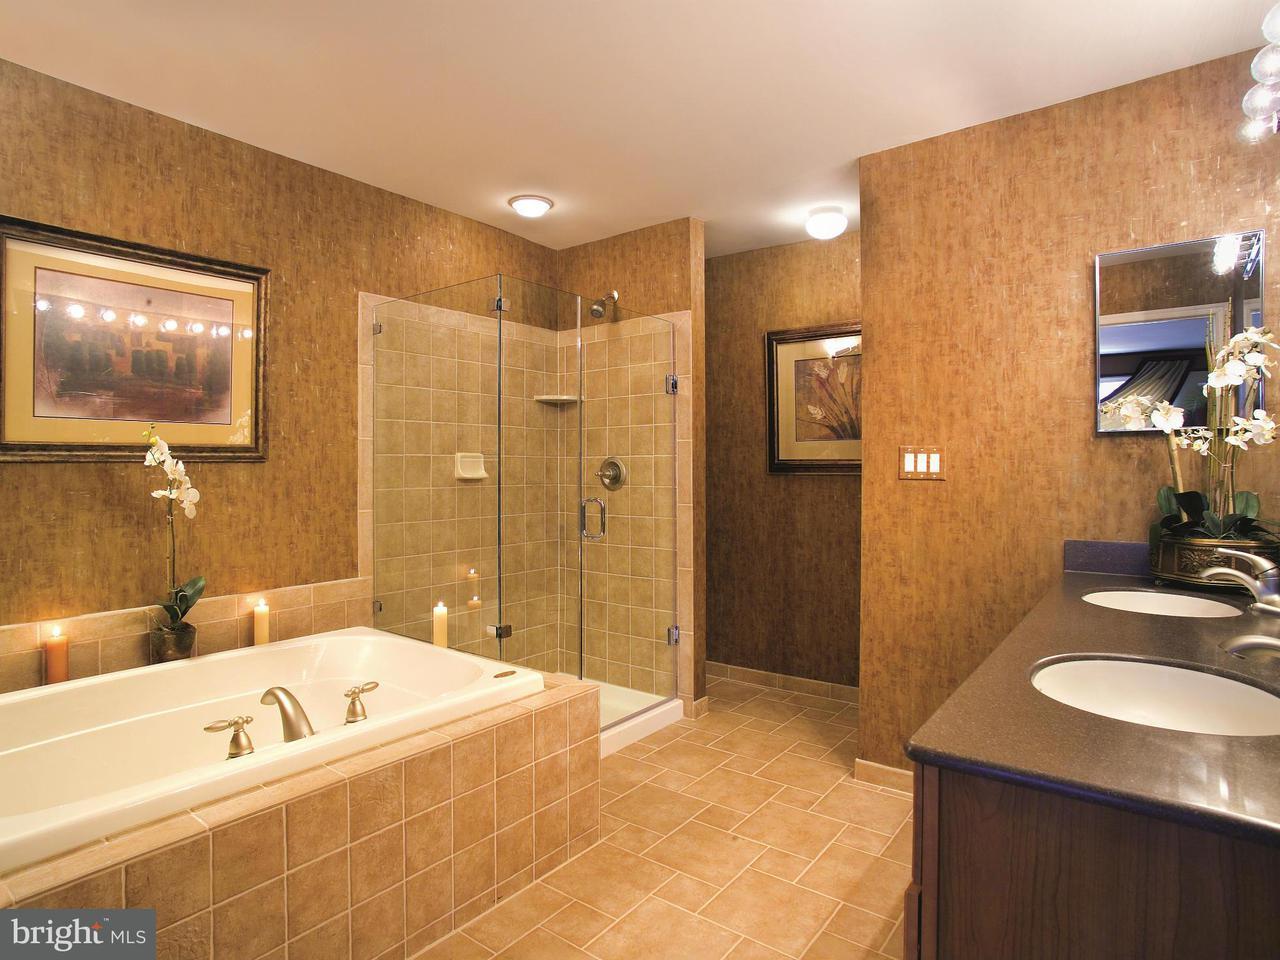 Additional photo for property listing at 15408 Cross Keys Road 15408 Cross Keys Road Haymarket, Virginia 20169 États-Unis